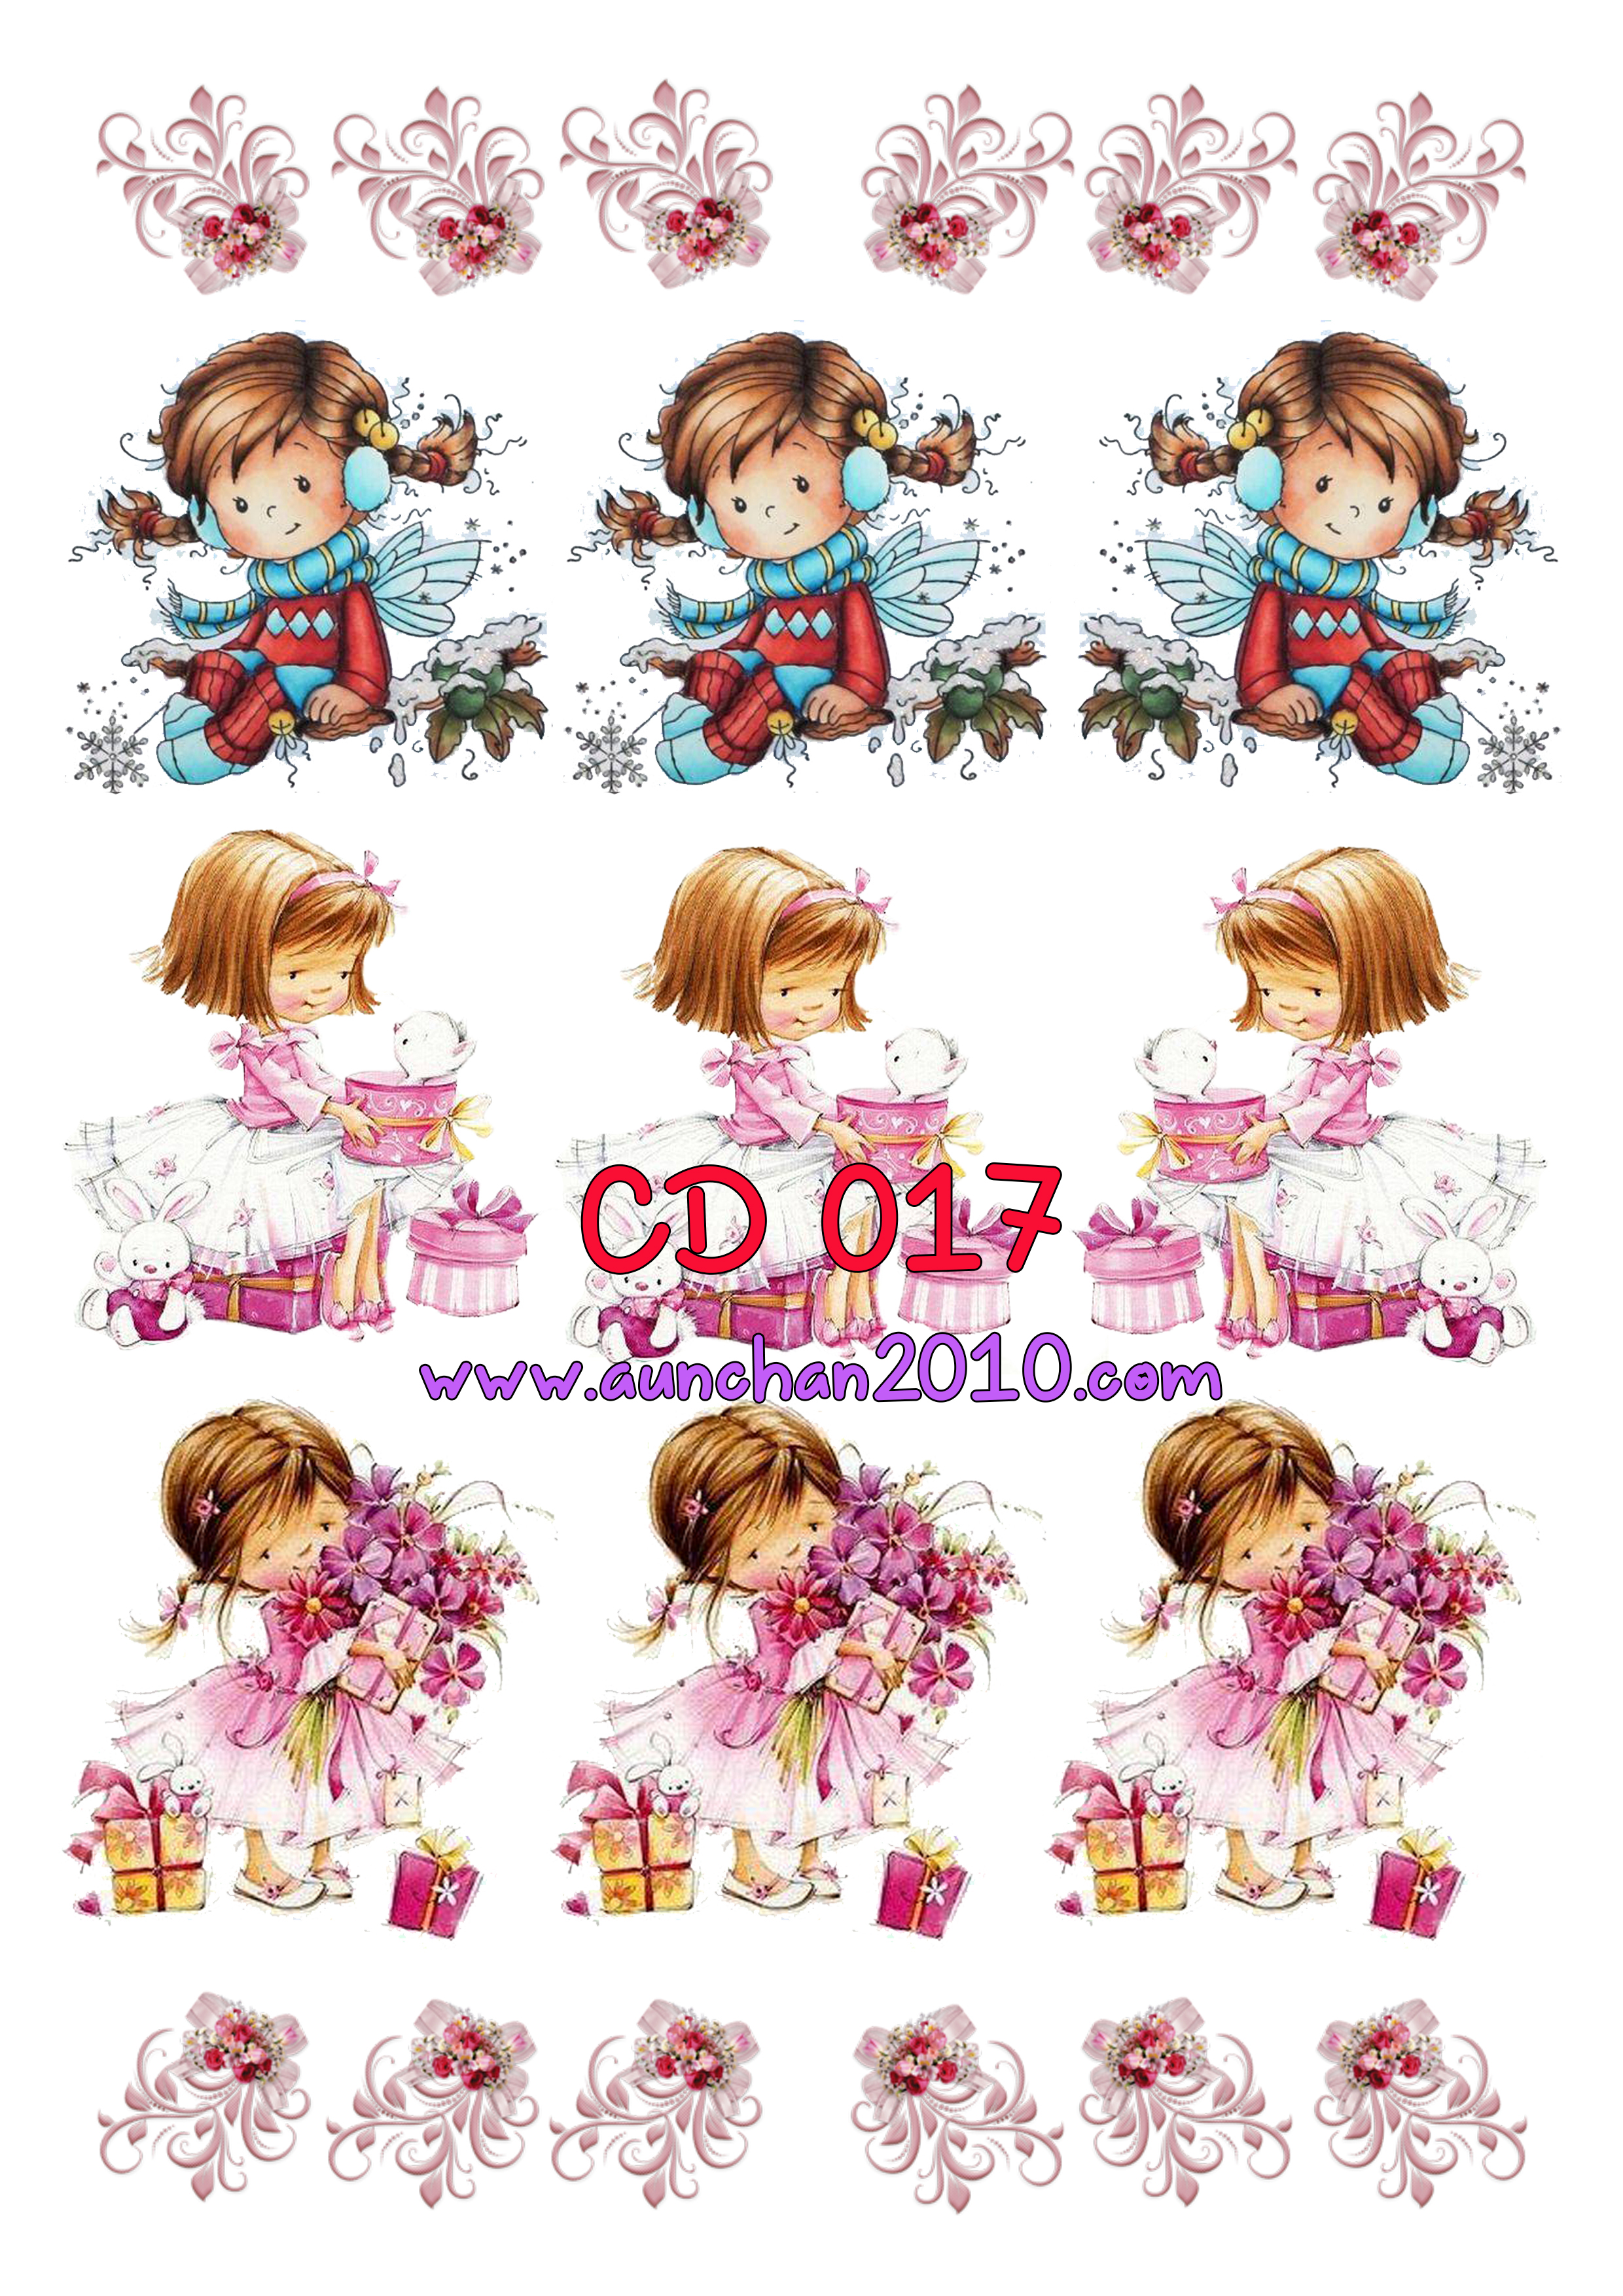 CD017 กระดาษแนพกิ้น 21x30ซม. ลายเด็ก